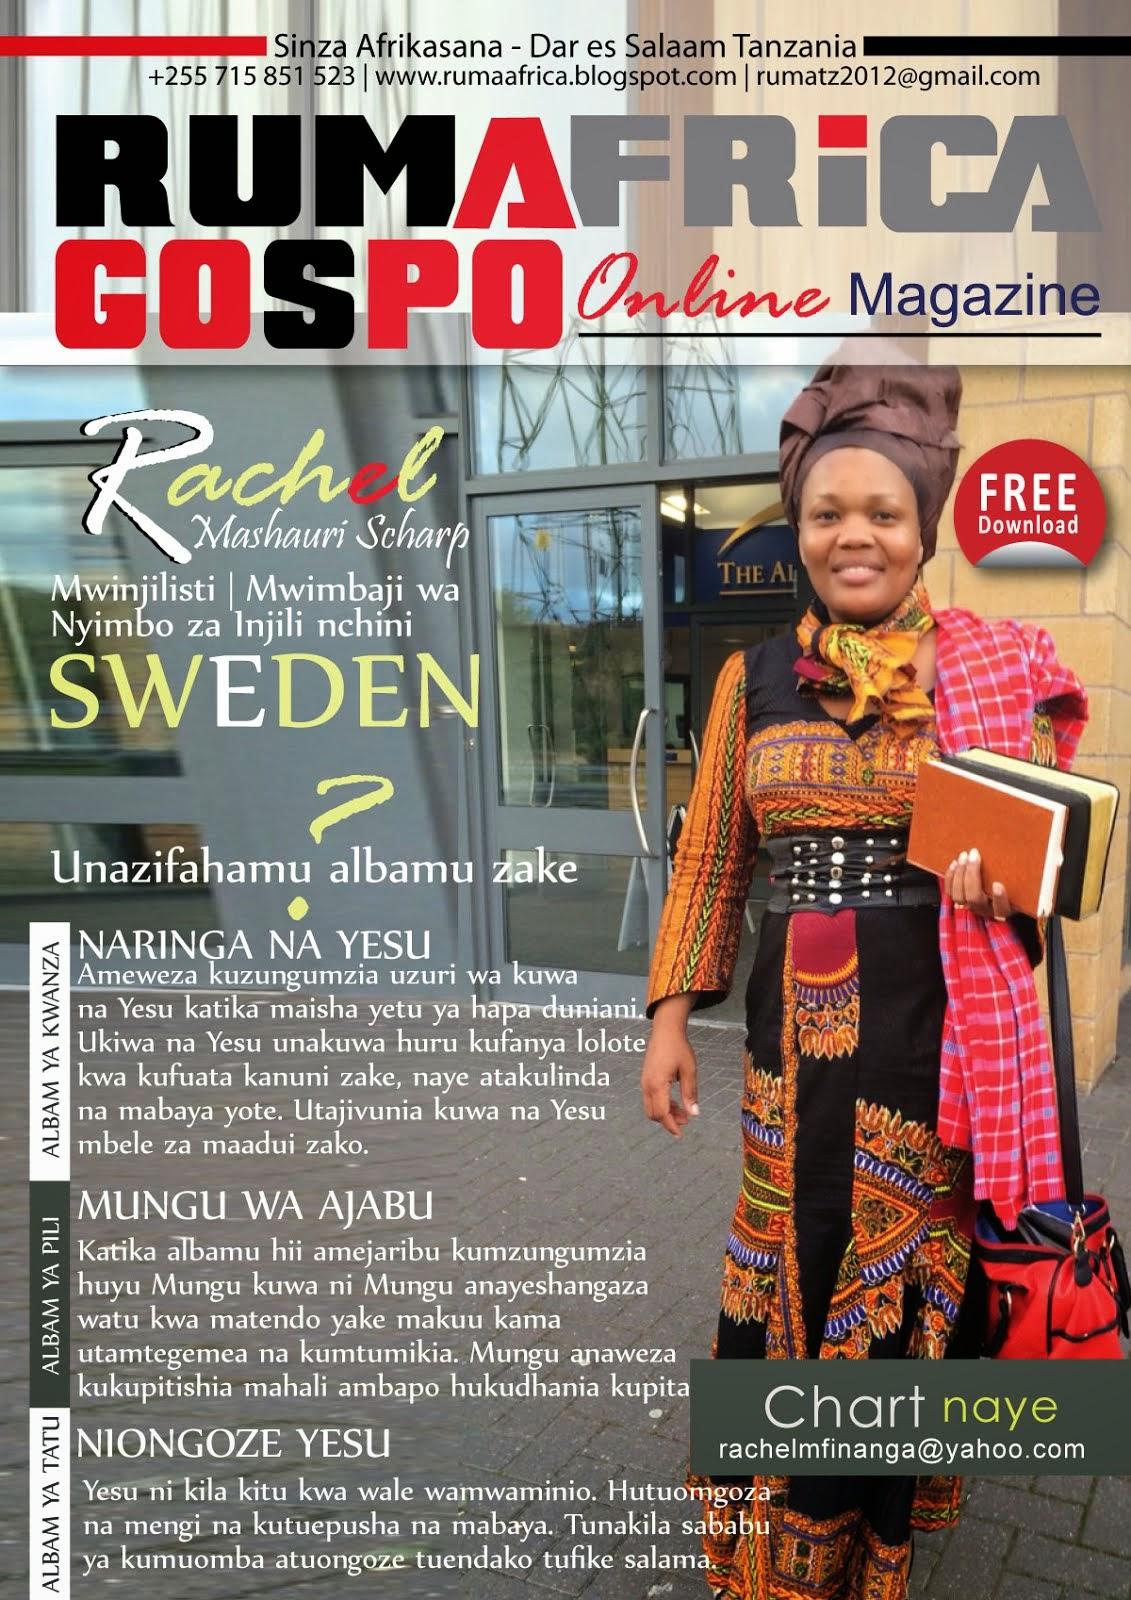 RACHEL SCHARP NDANI YA RUMAFRICA GOSPO Online MAGAZINE